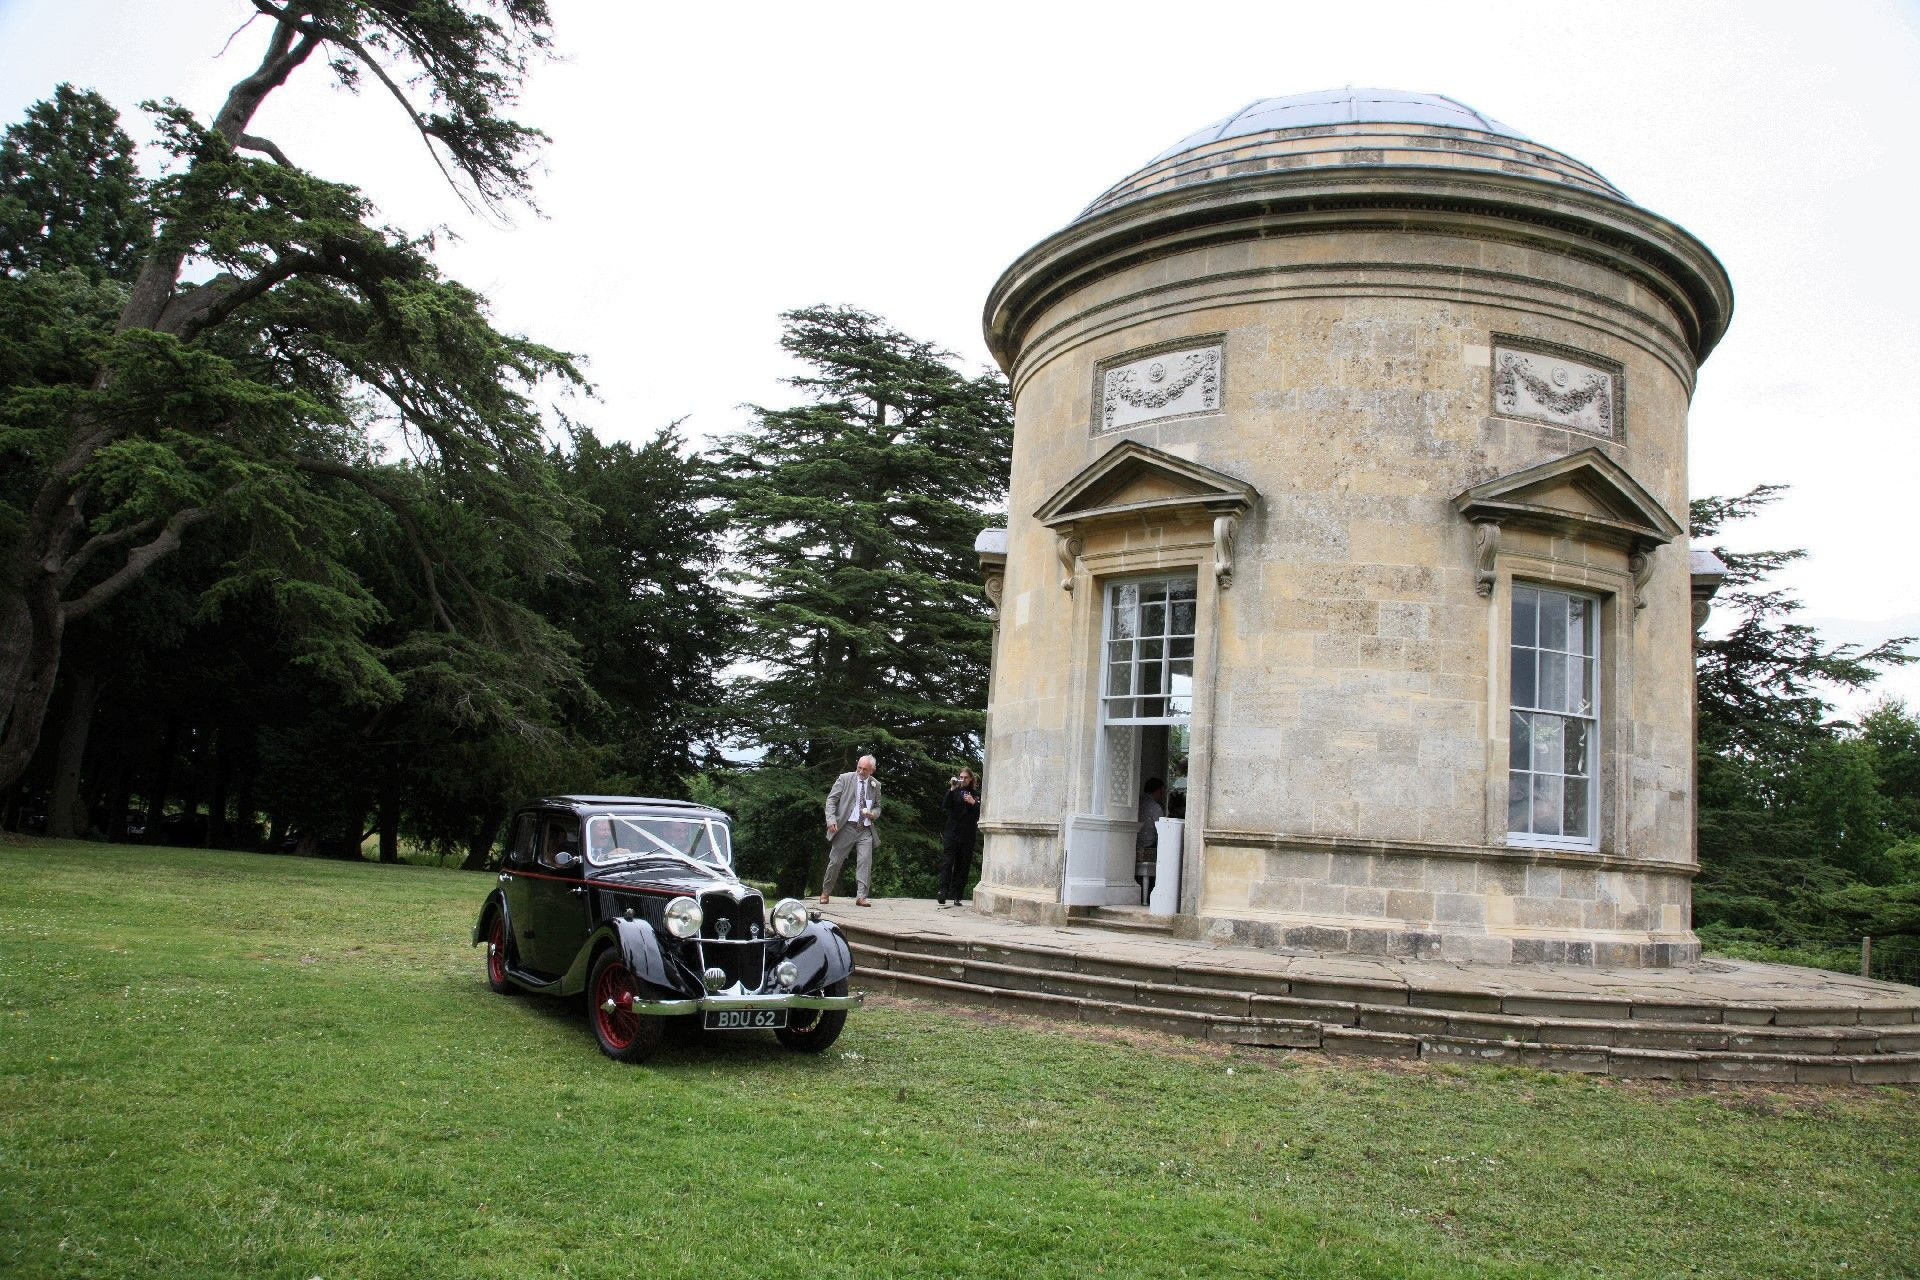 The Rotunda, Croome. Worcestershire, UK